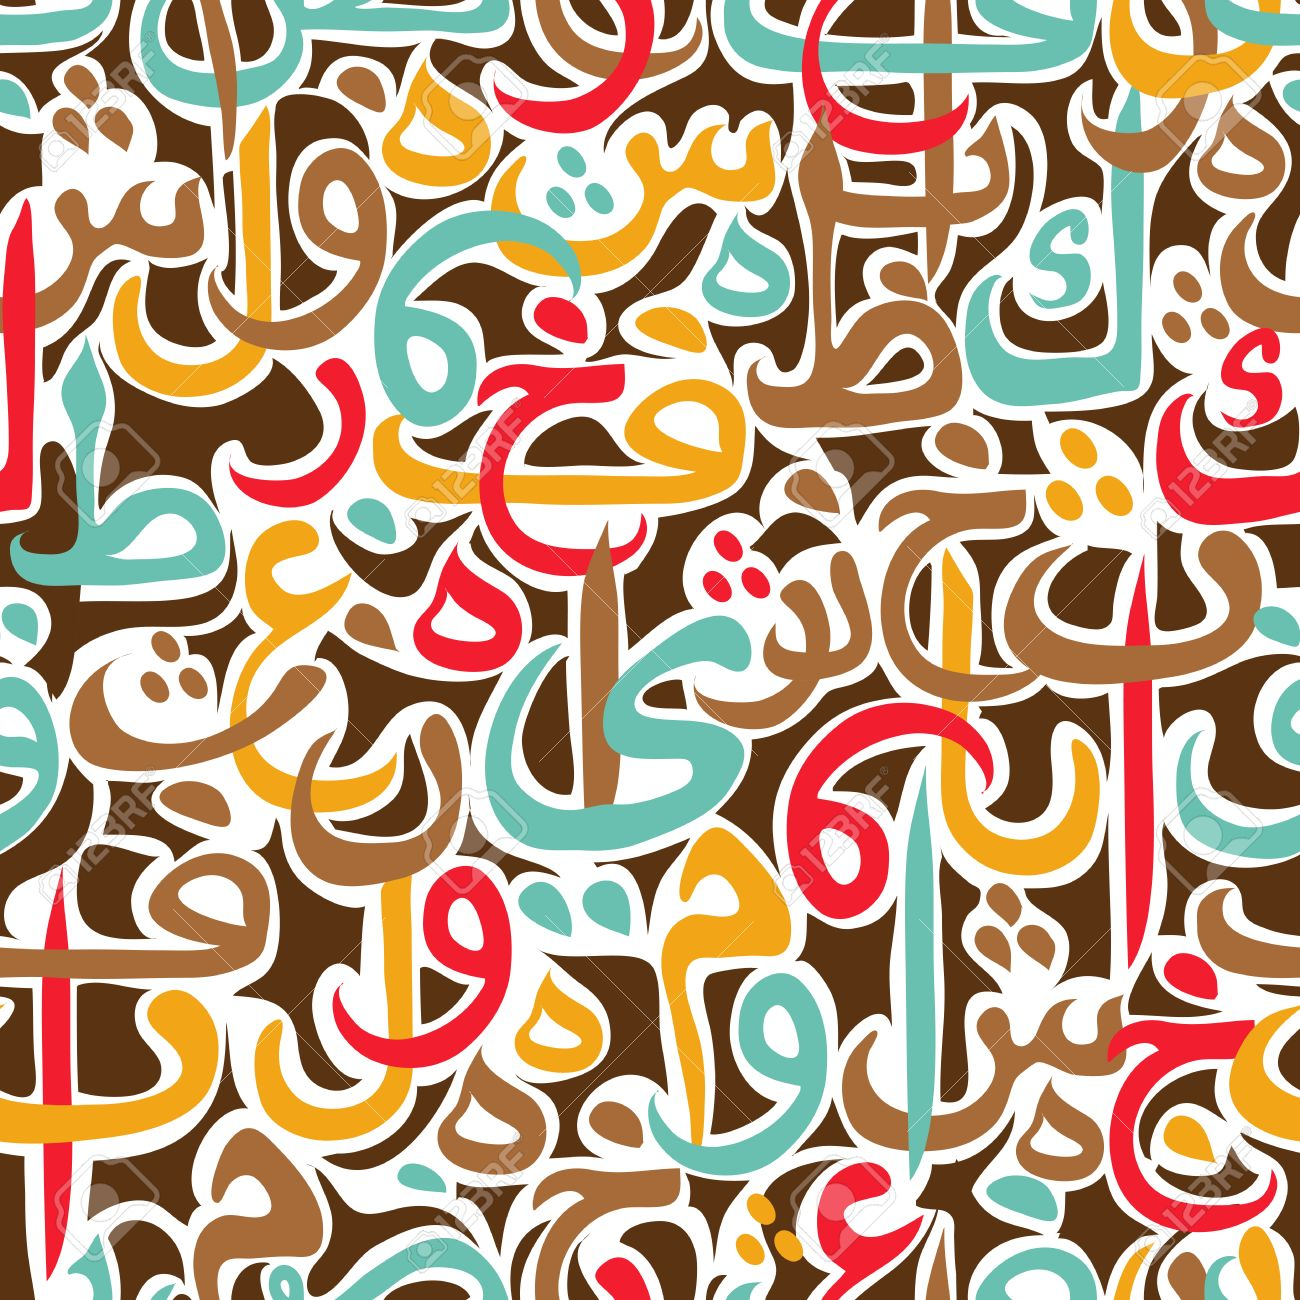 seamless pattern ornament Arabic calligraphy of text Eid Mubarak concept for muslim community festival Eid Al FitrEid Mubarak - 48036520